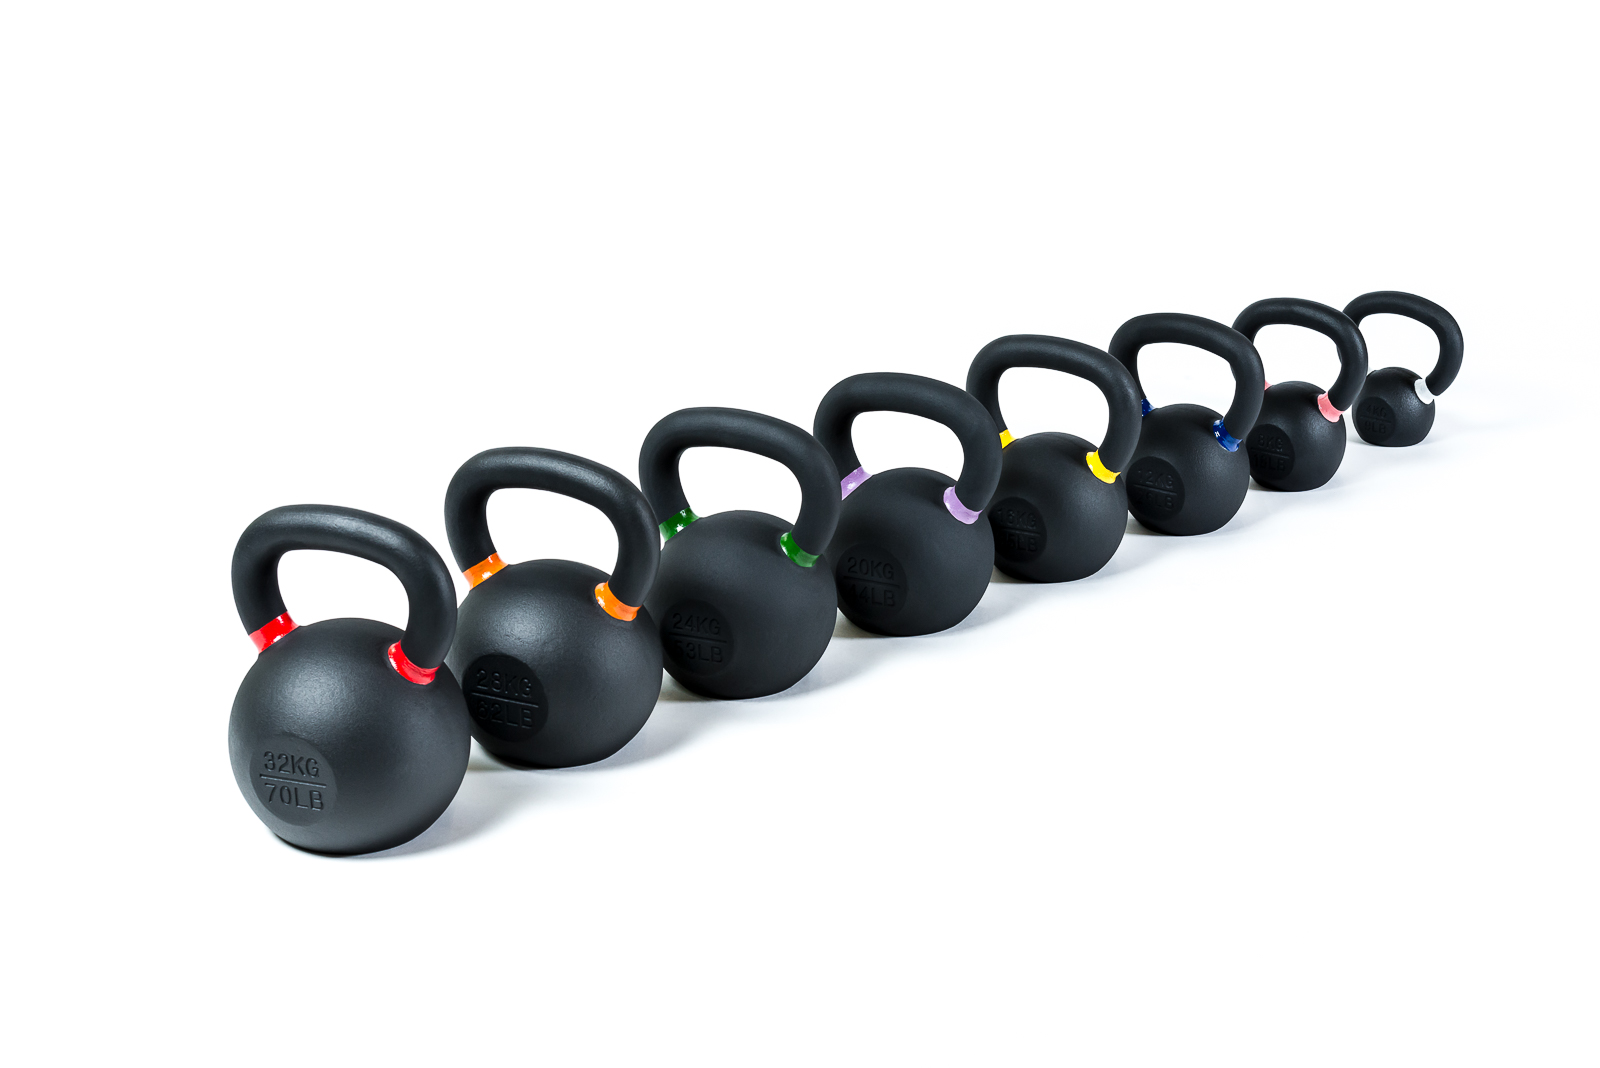 LG00150-LG00168-Kettlebells-Colored-Ring